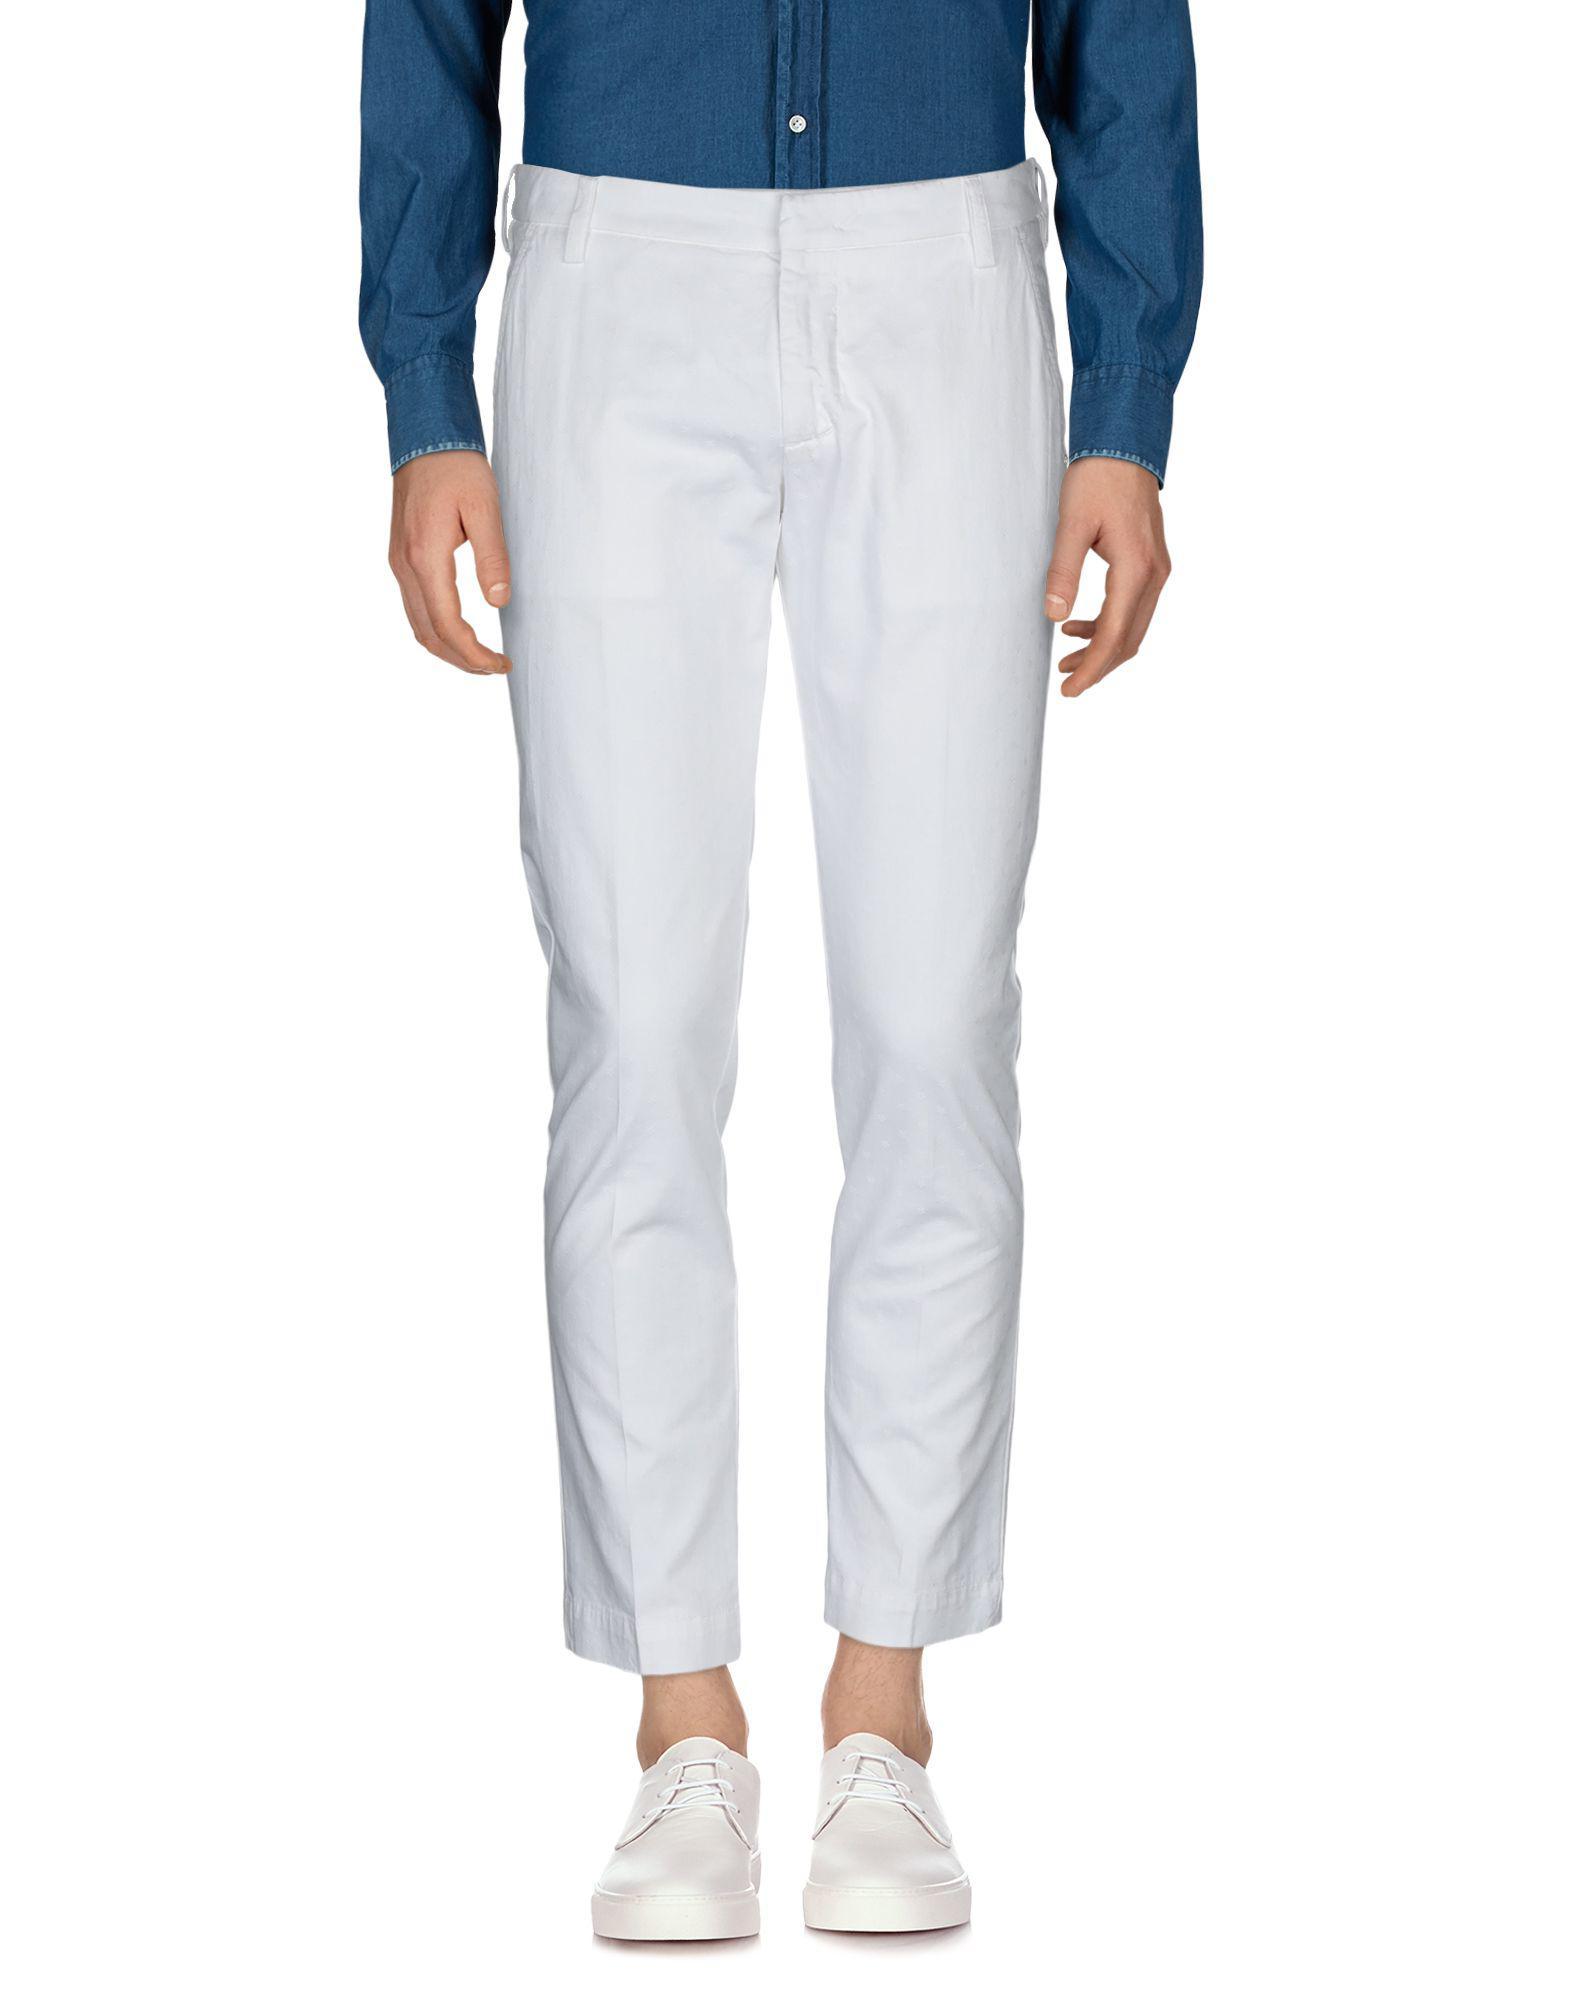 Lyst - Entre Amis Casual Trouser in White for Men fa2fb9adb28